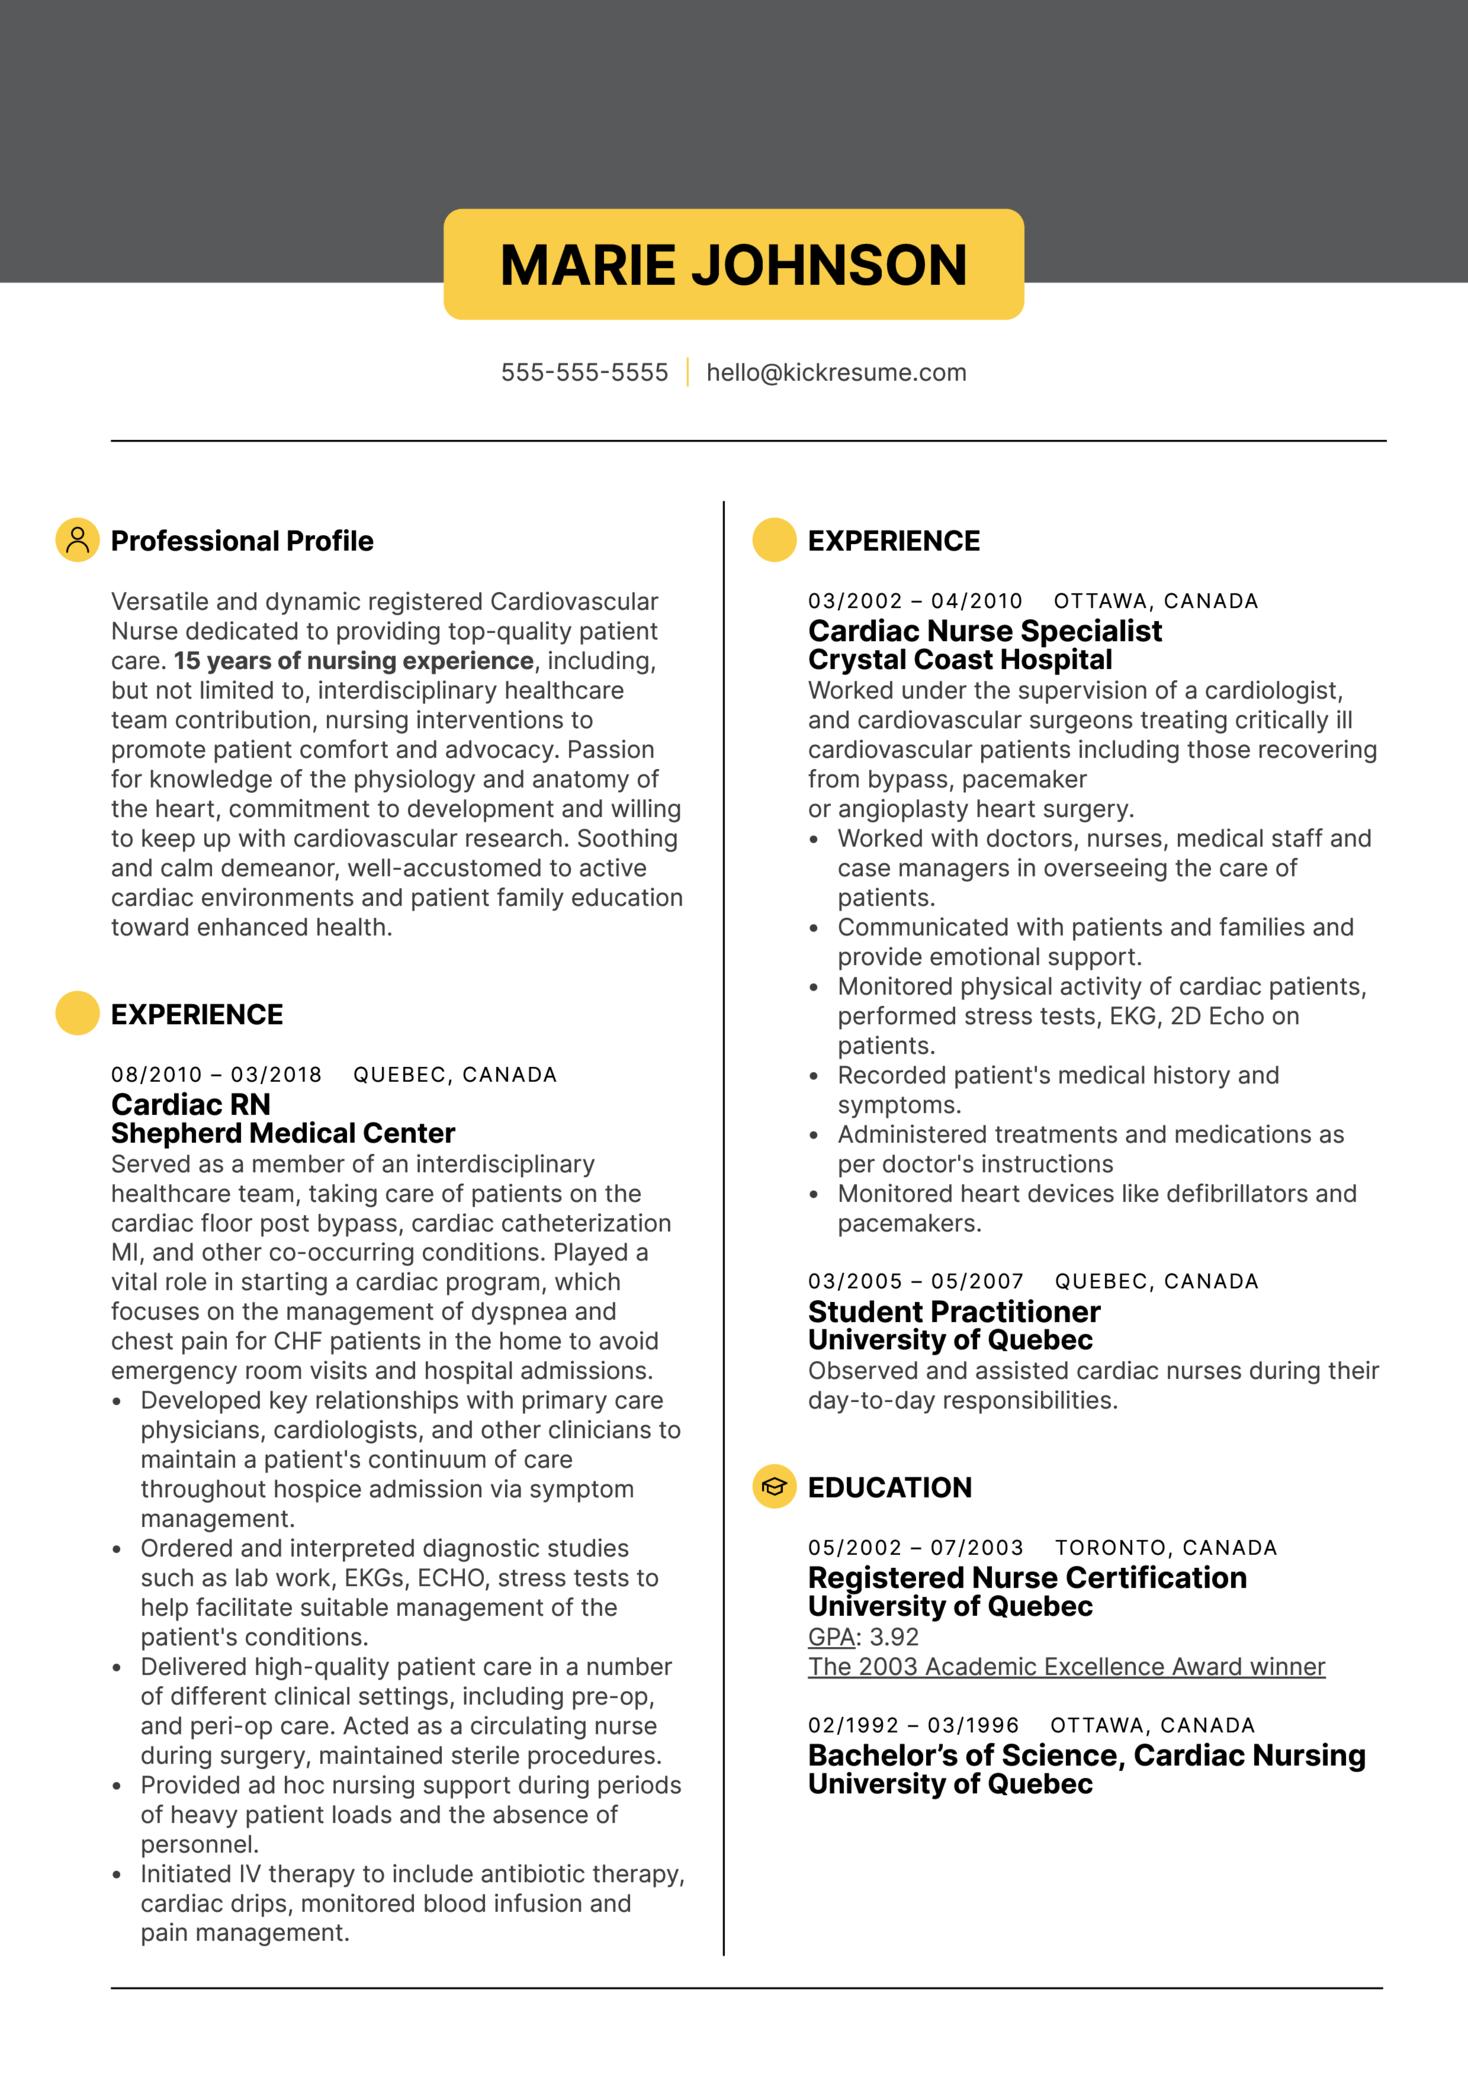 Cardiac Nurse Resume Sample (Part 1)